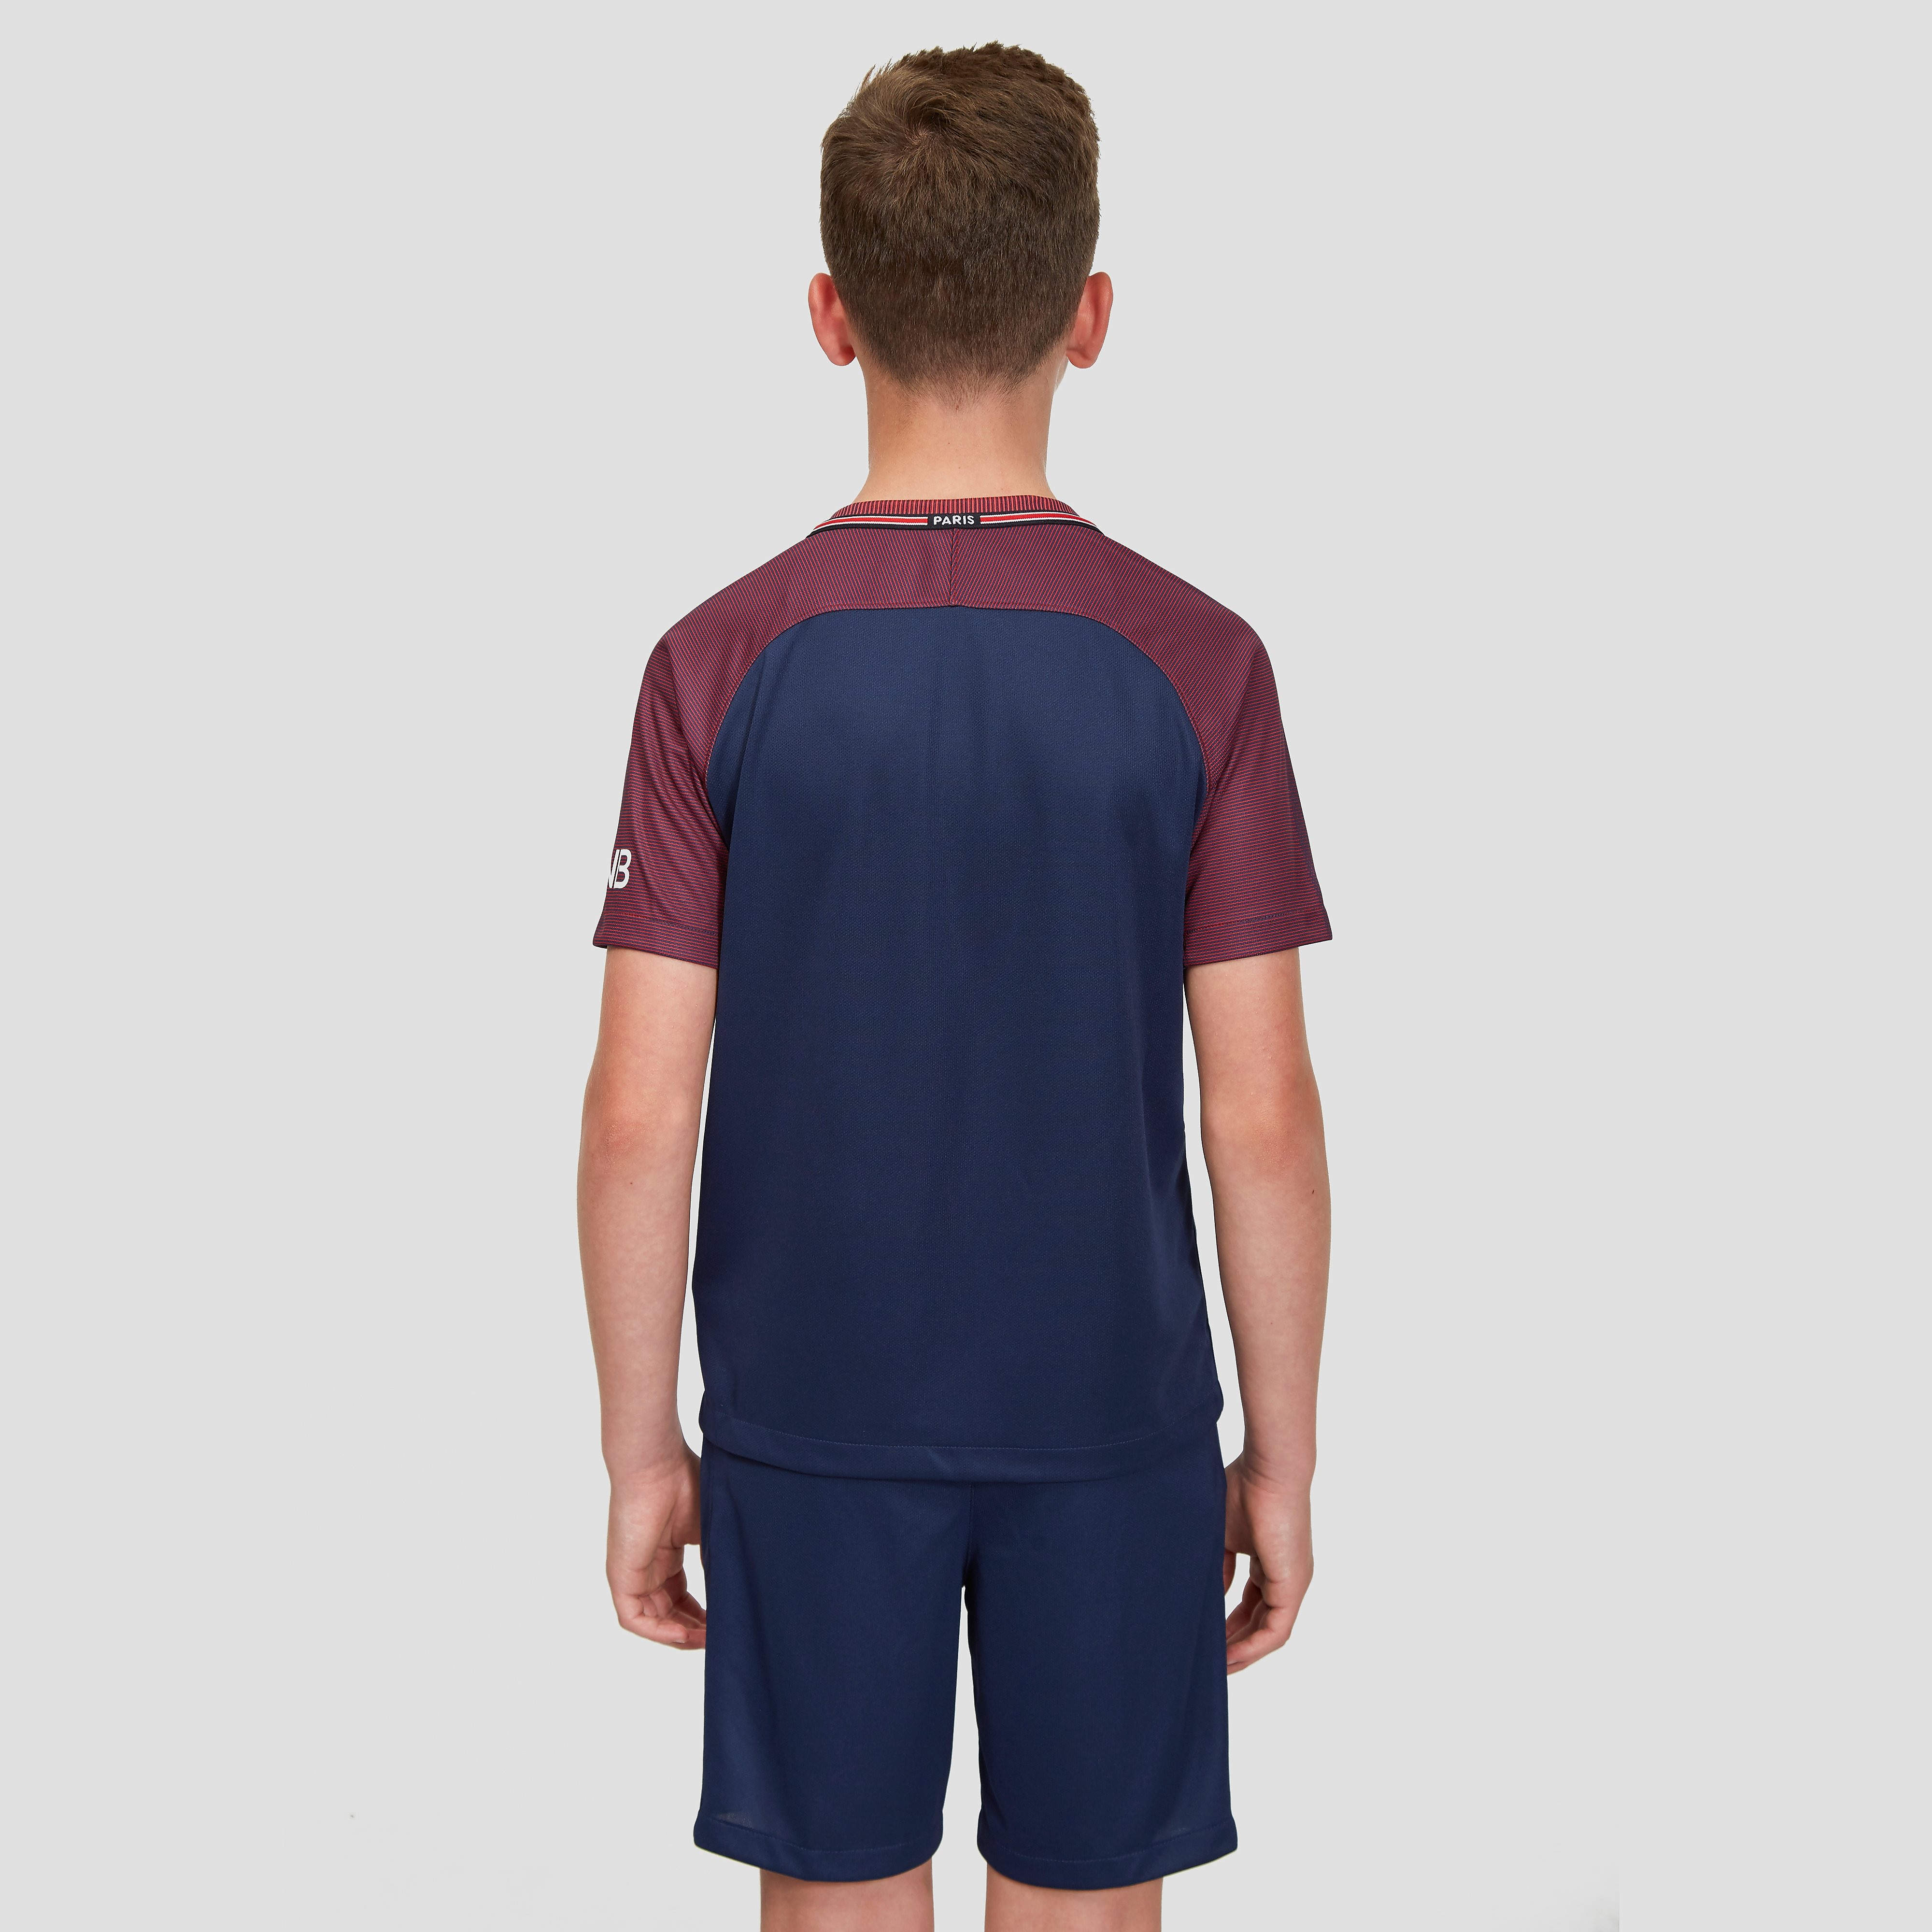 Nike Paris Saint Germain 2017/18 Junior Home Shirt